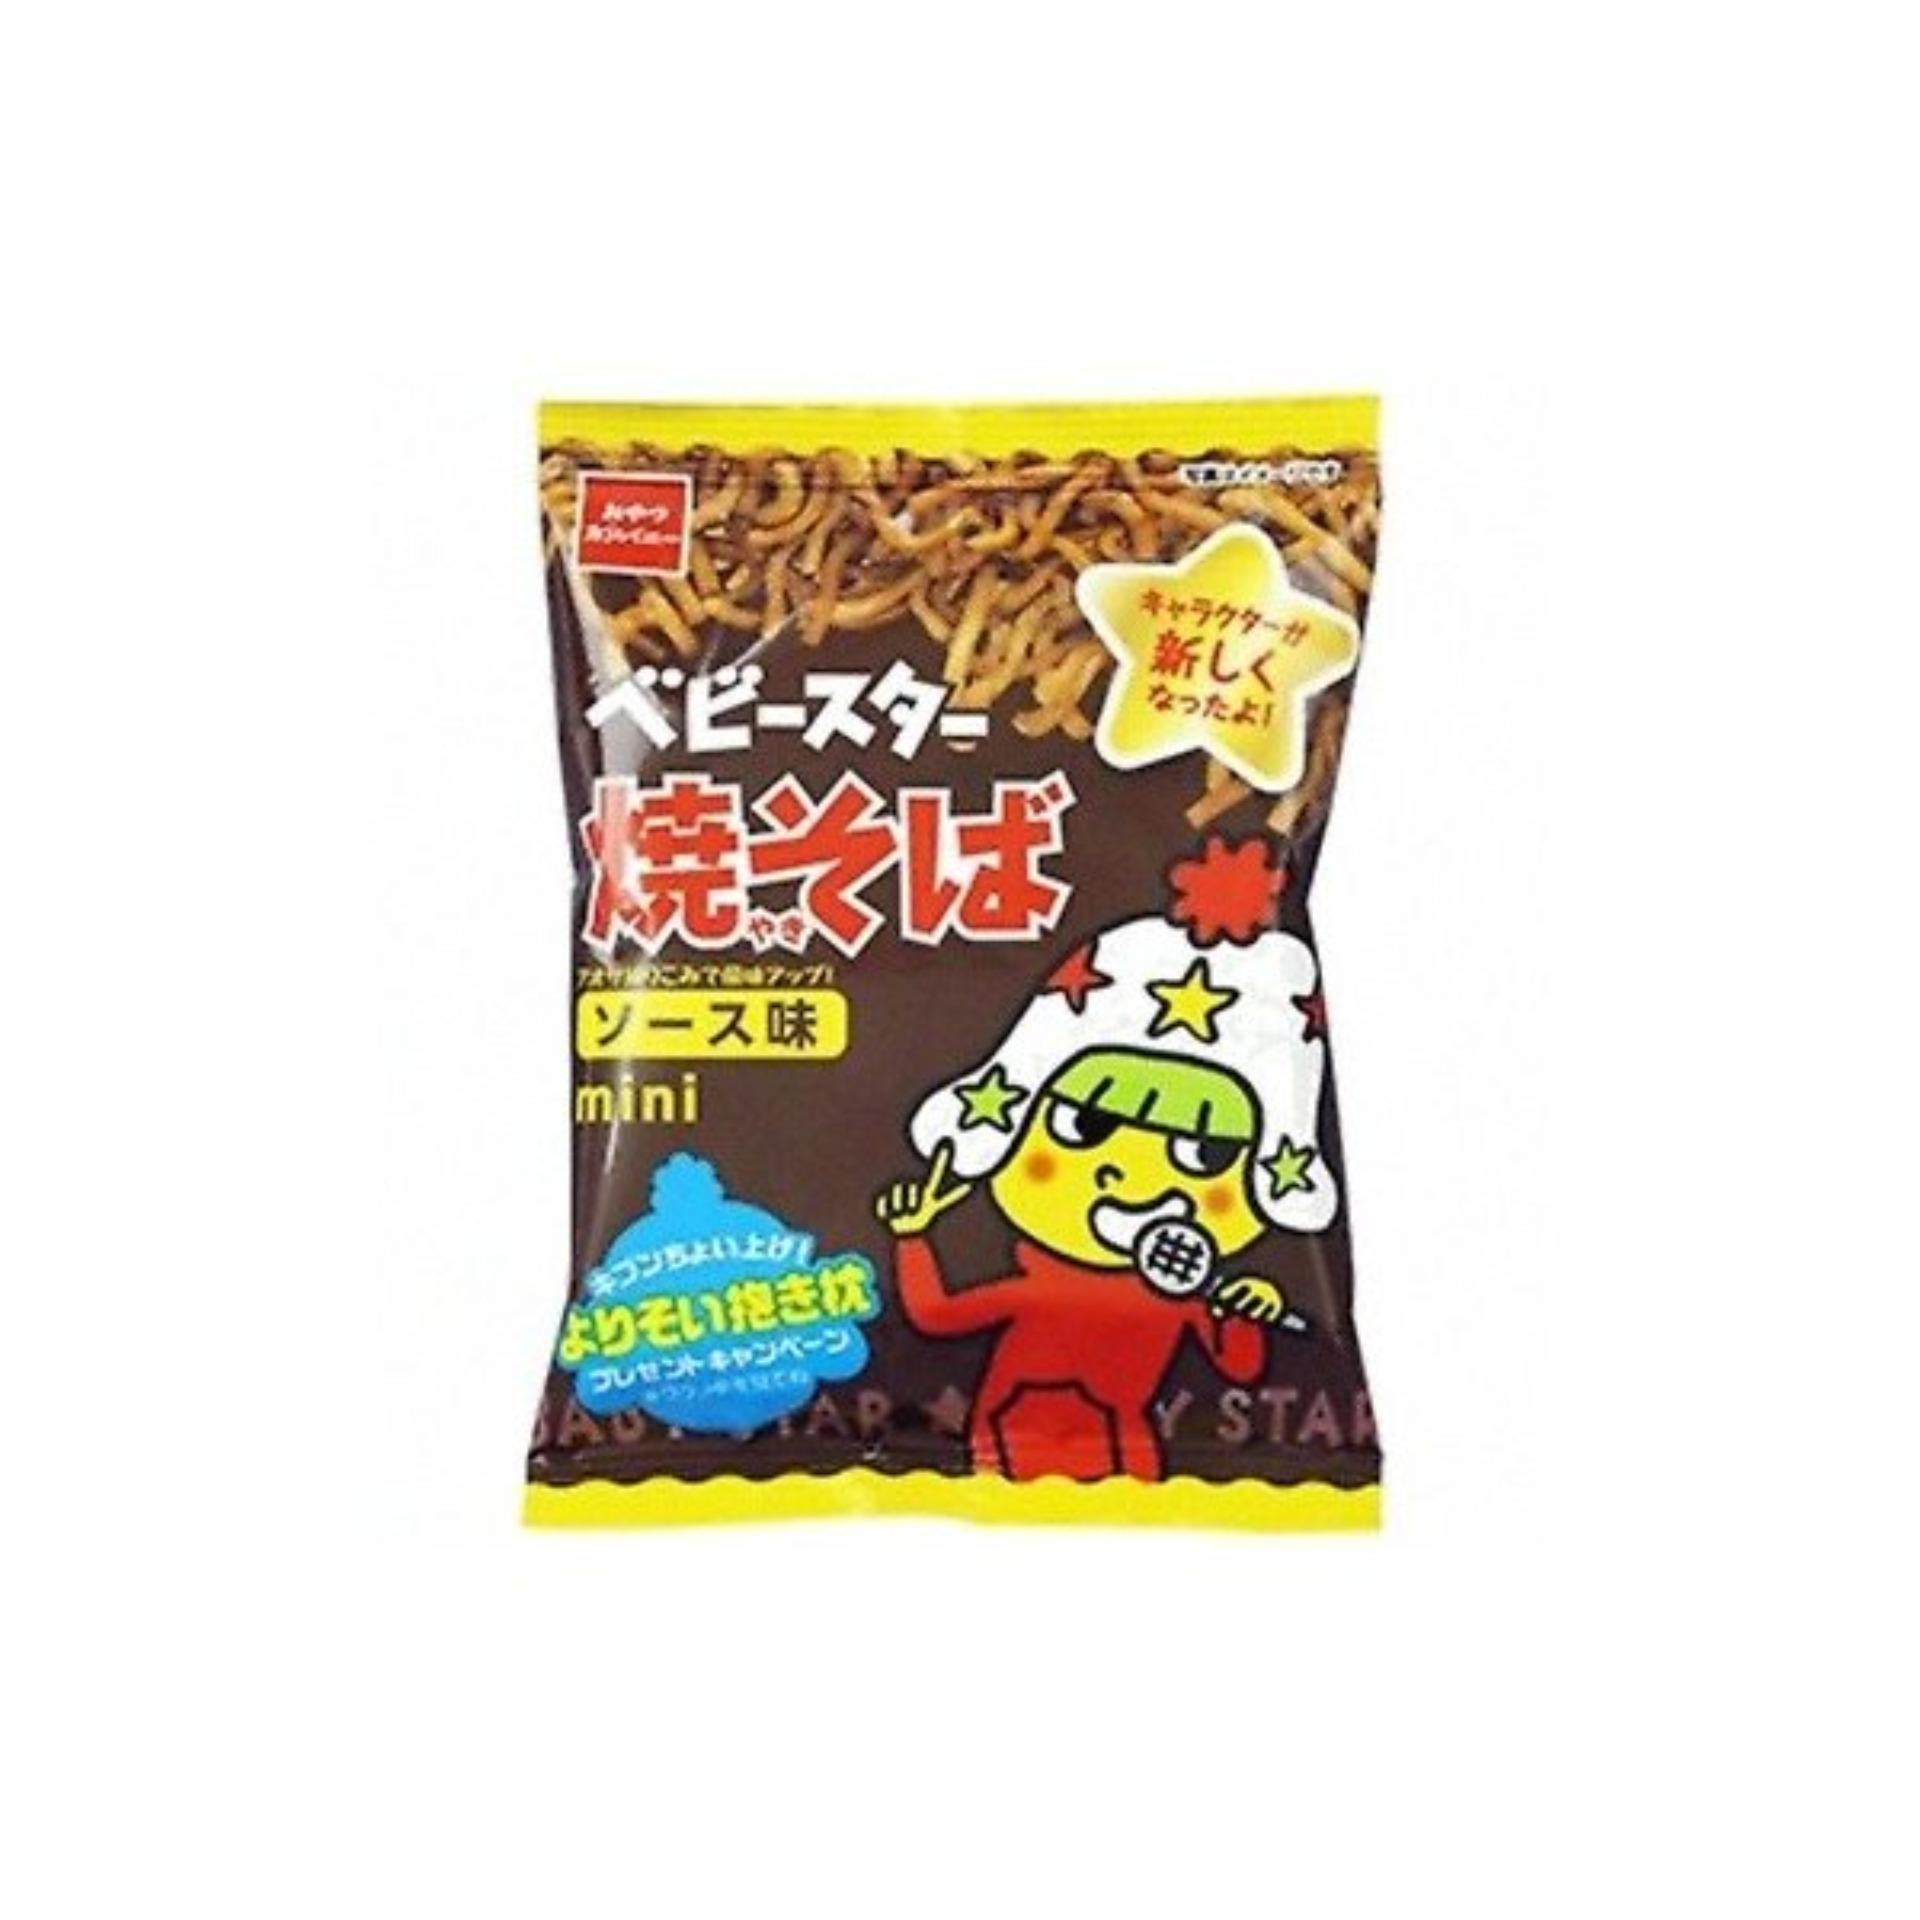 Snack Mini Ramen vị Yakisoba